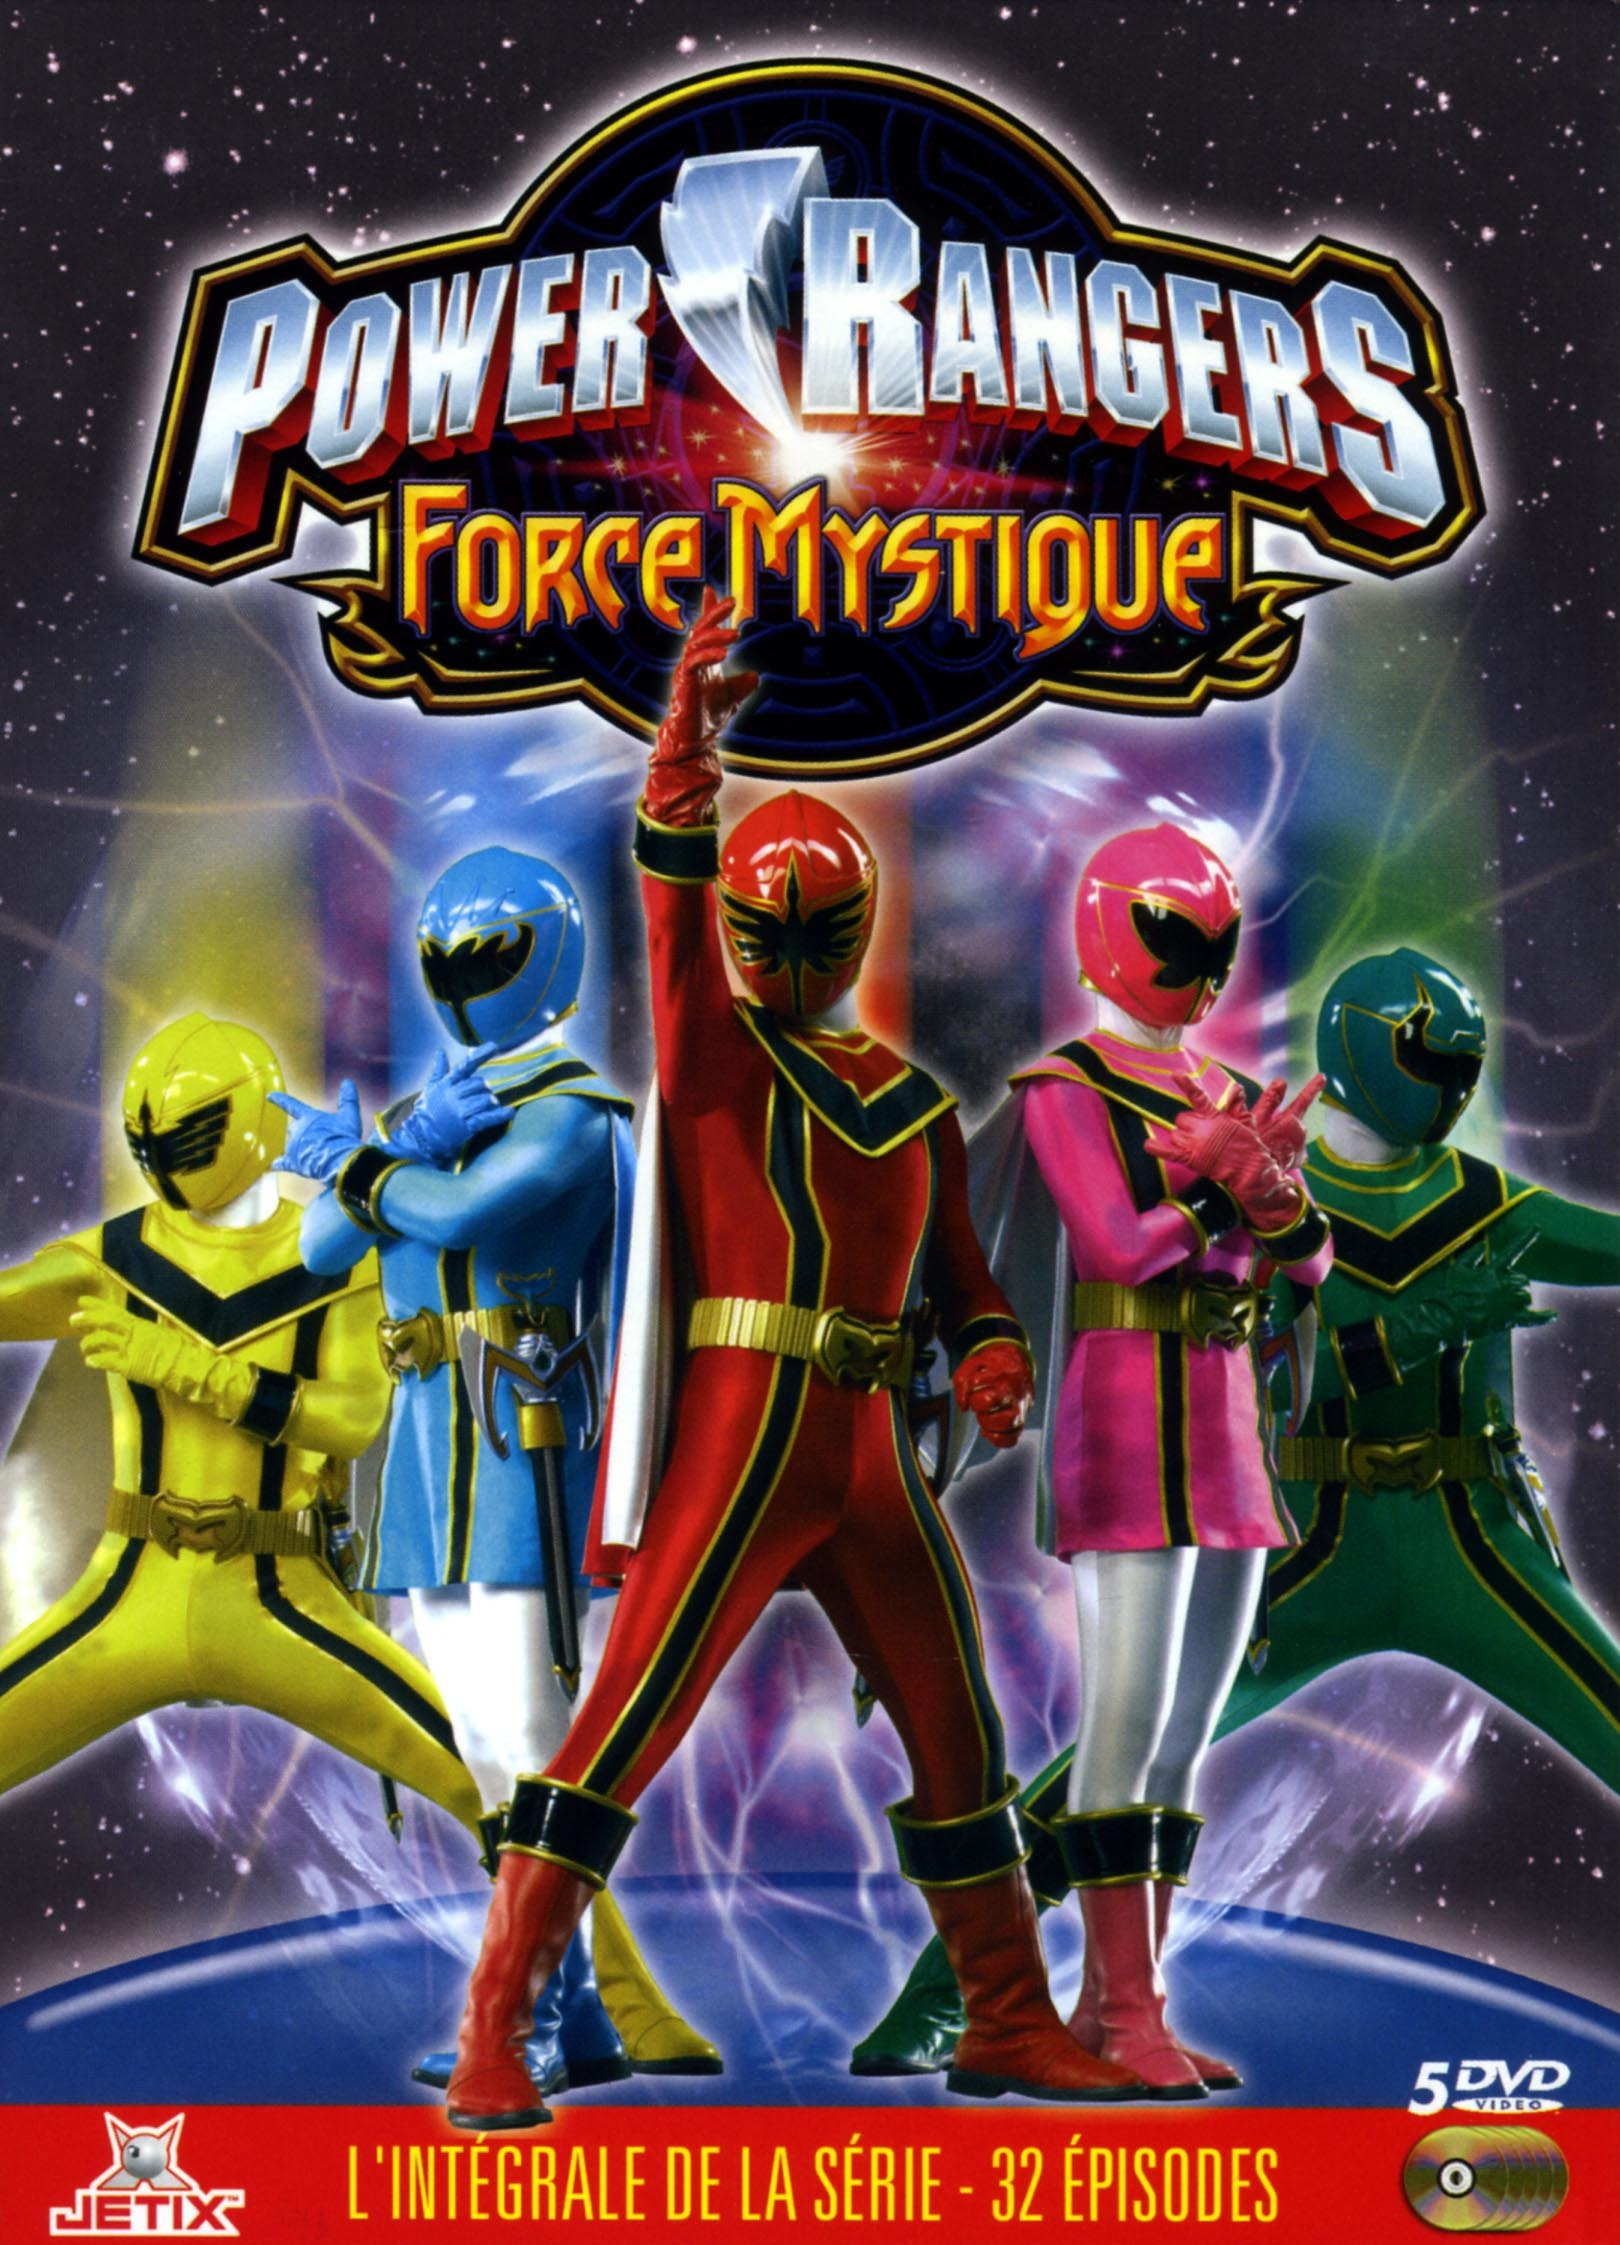 POWER RANGERS FORCE... - 5 DVD...MYSTIQUE